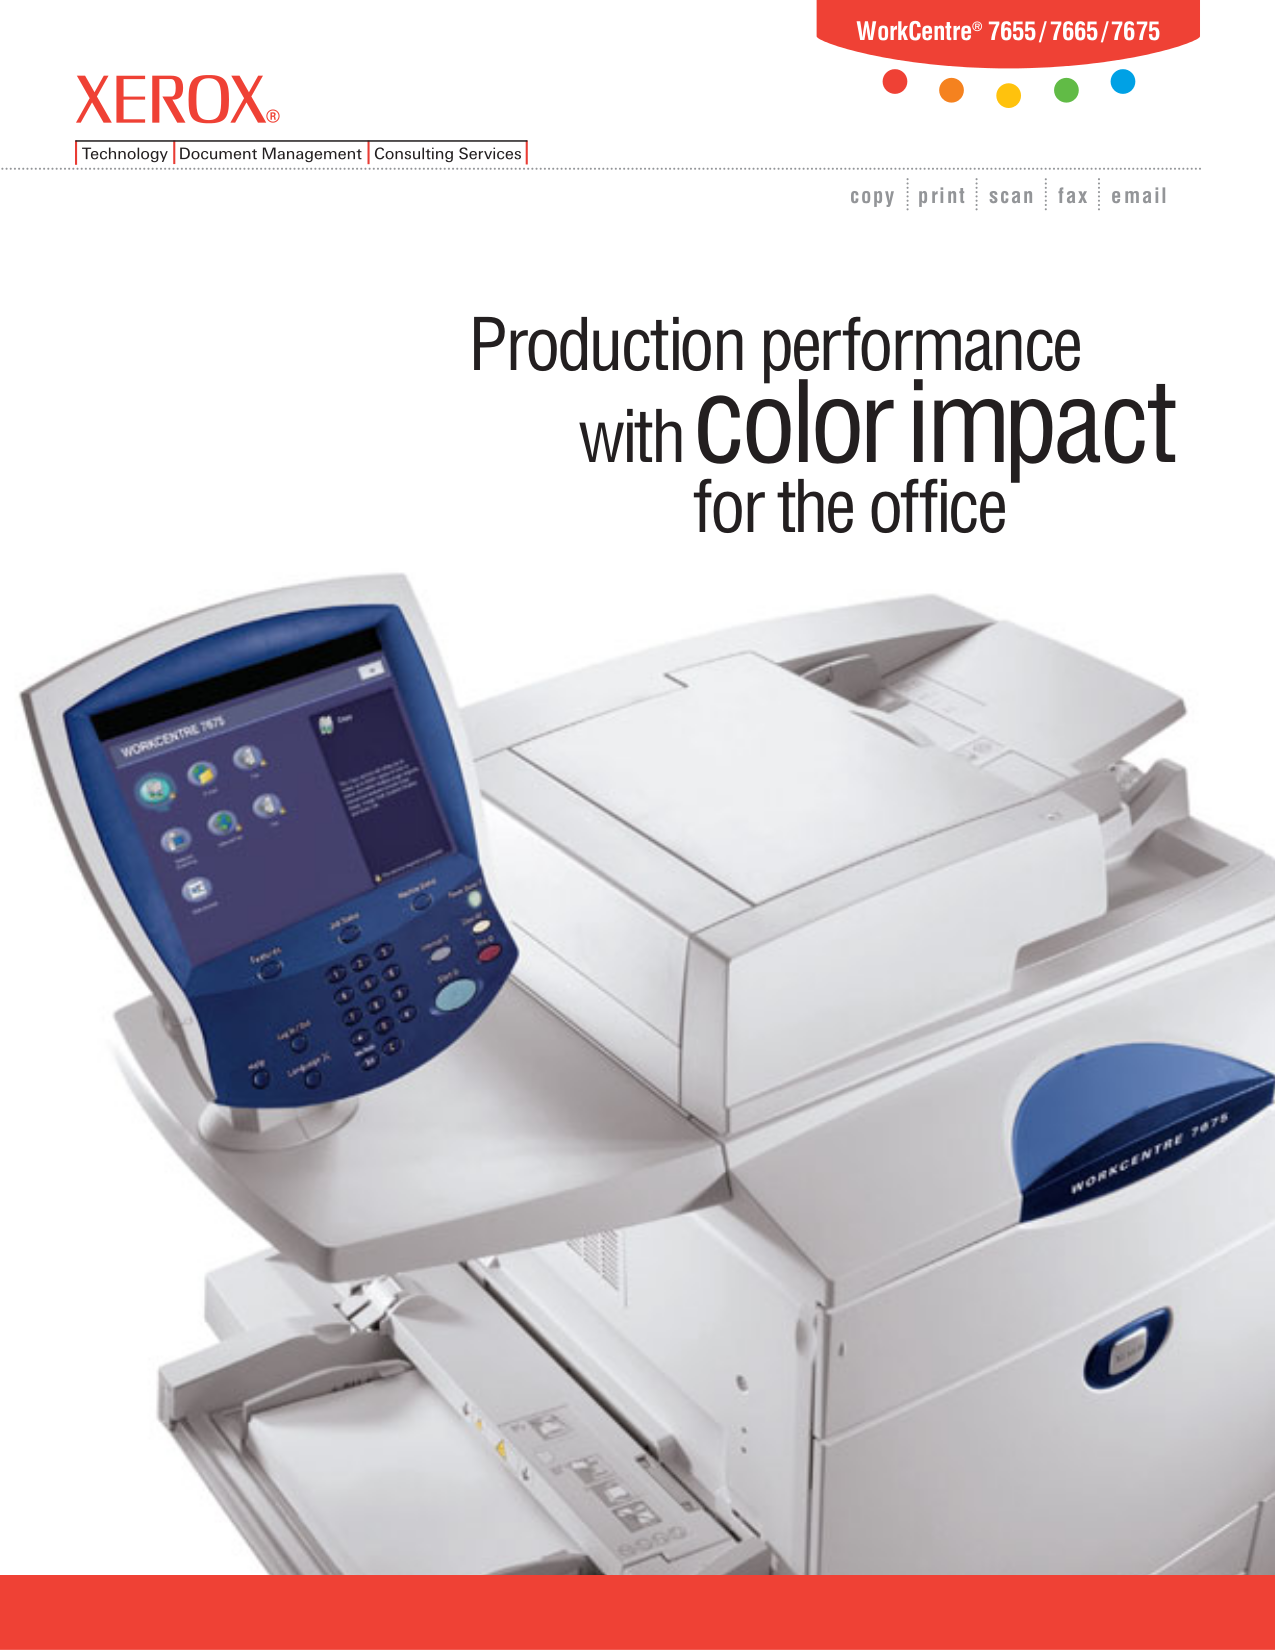 download free pdf for xerox workcentre 7675 multifunction printer manual rh umlib com Xerox WorkCentre 7535 xerox workcentre 7675 service manual